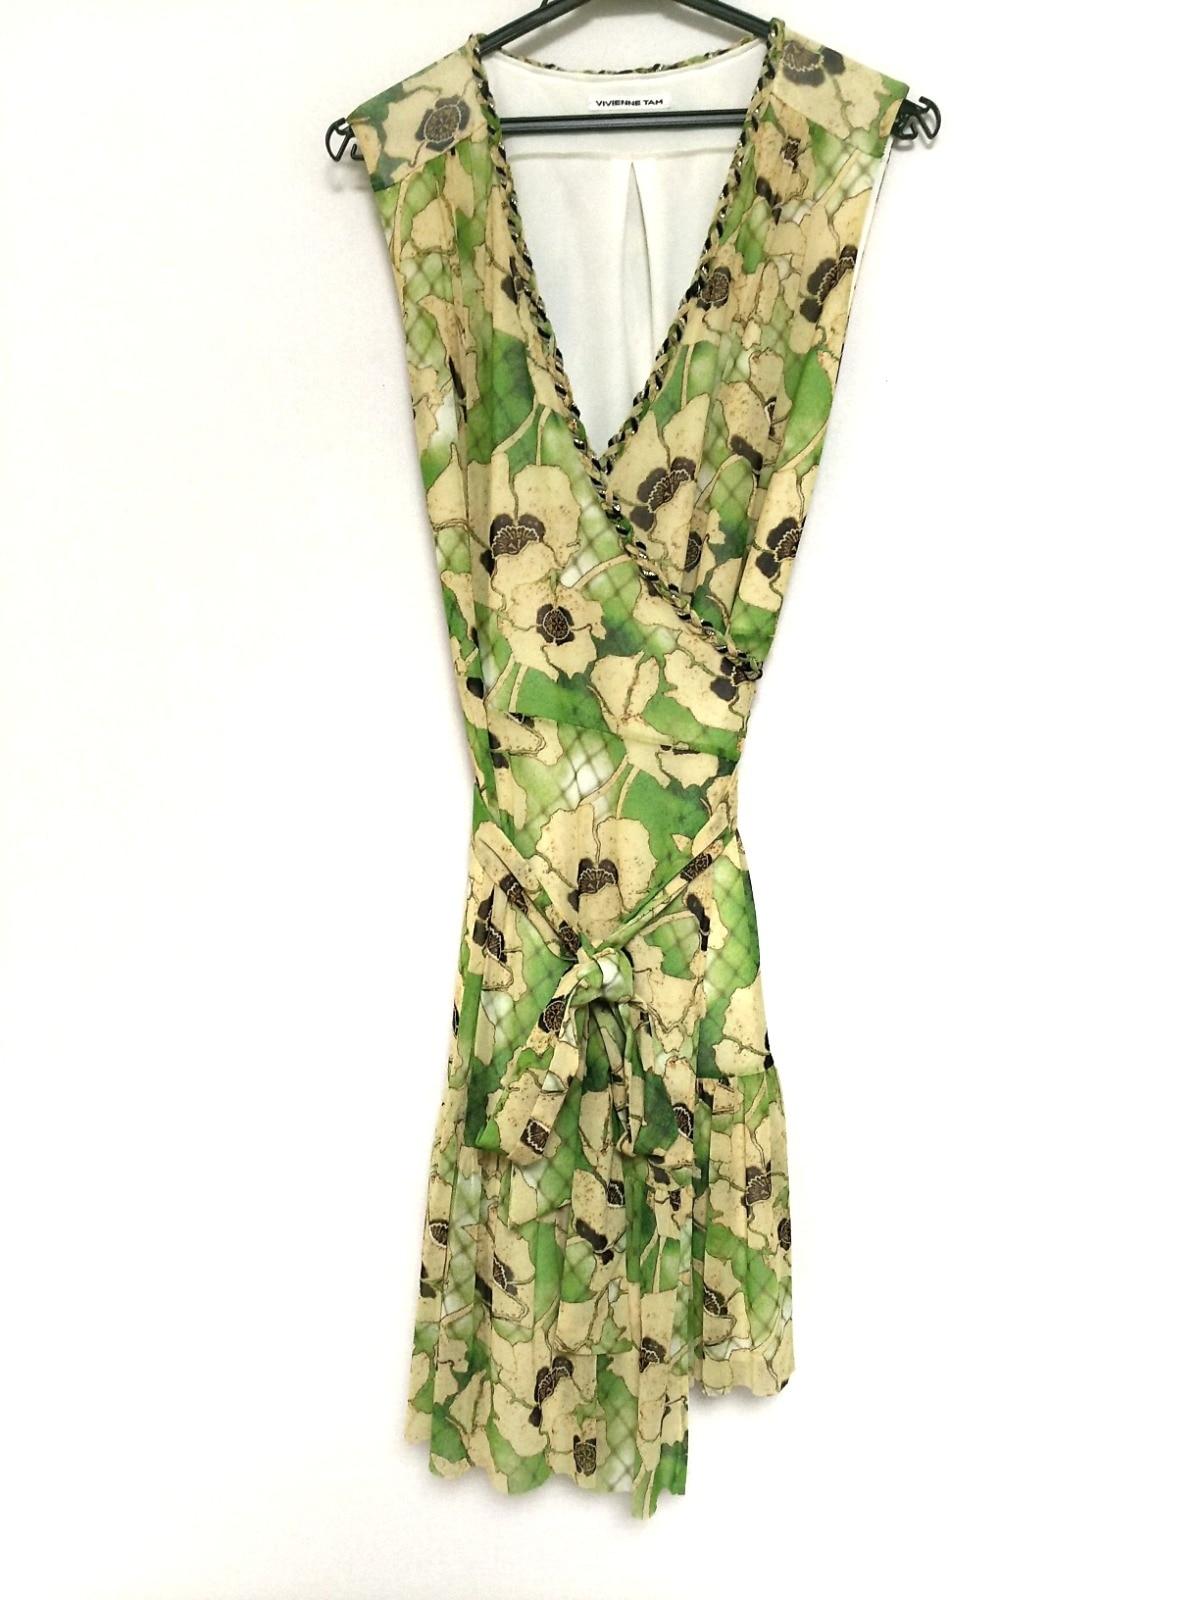 VIVIENNE TAM(ヴィヴィアンタム)のワンピーススーツ